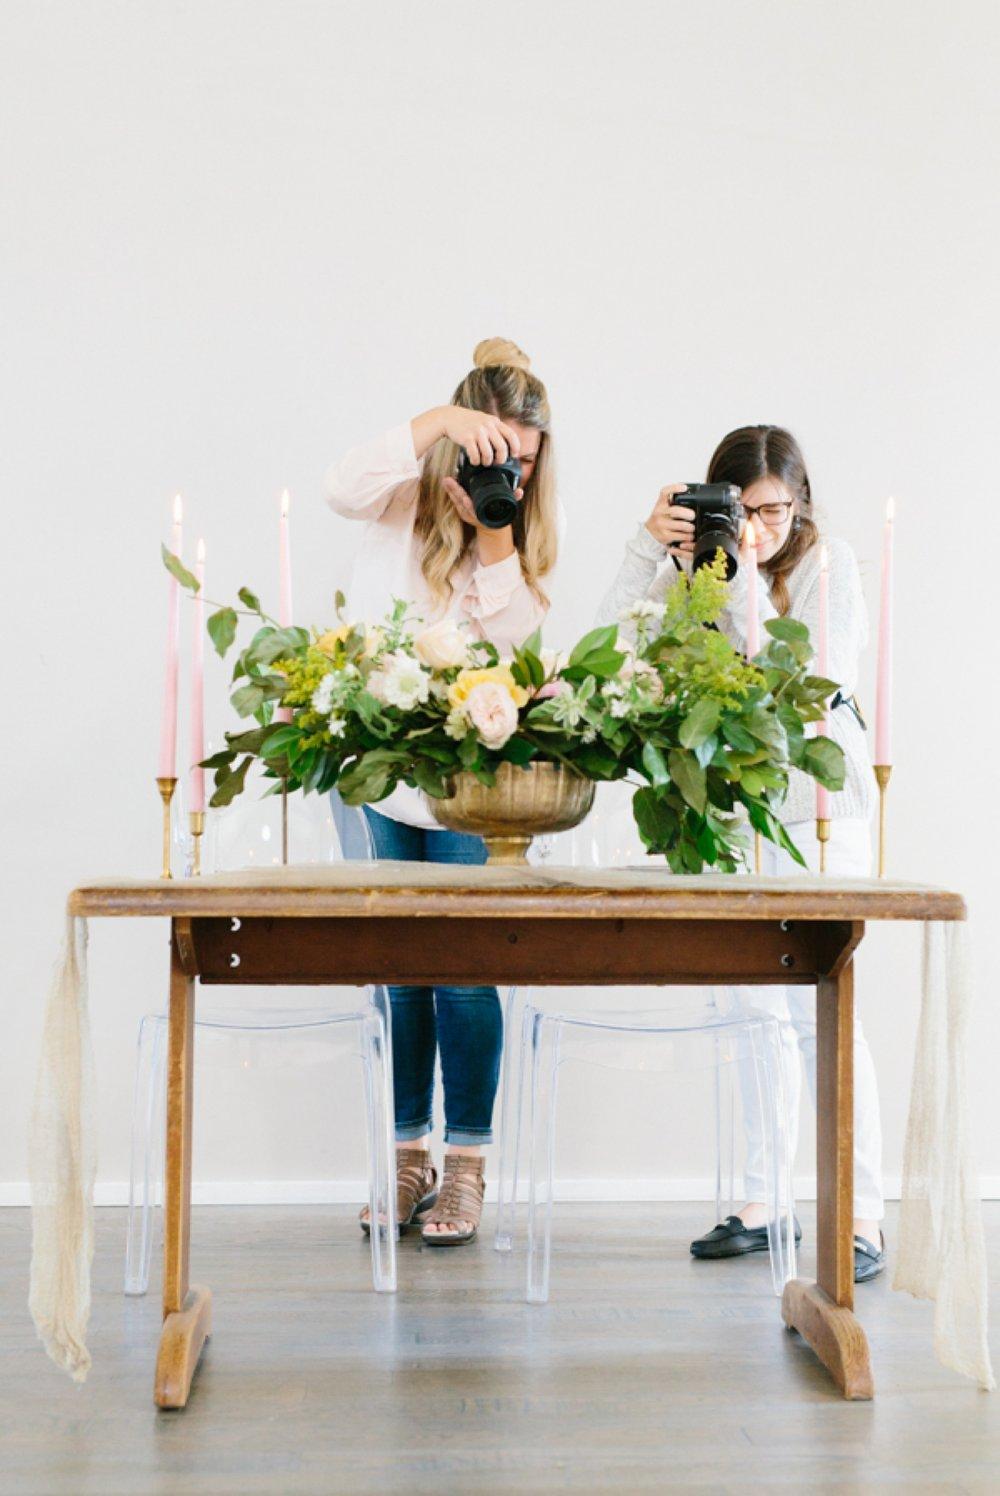 Dream Chasers Seabrook, Washington Photography Workshop | Pacific Northwest Photography Workshop | Emma Rose Company Education 34.jpg